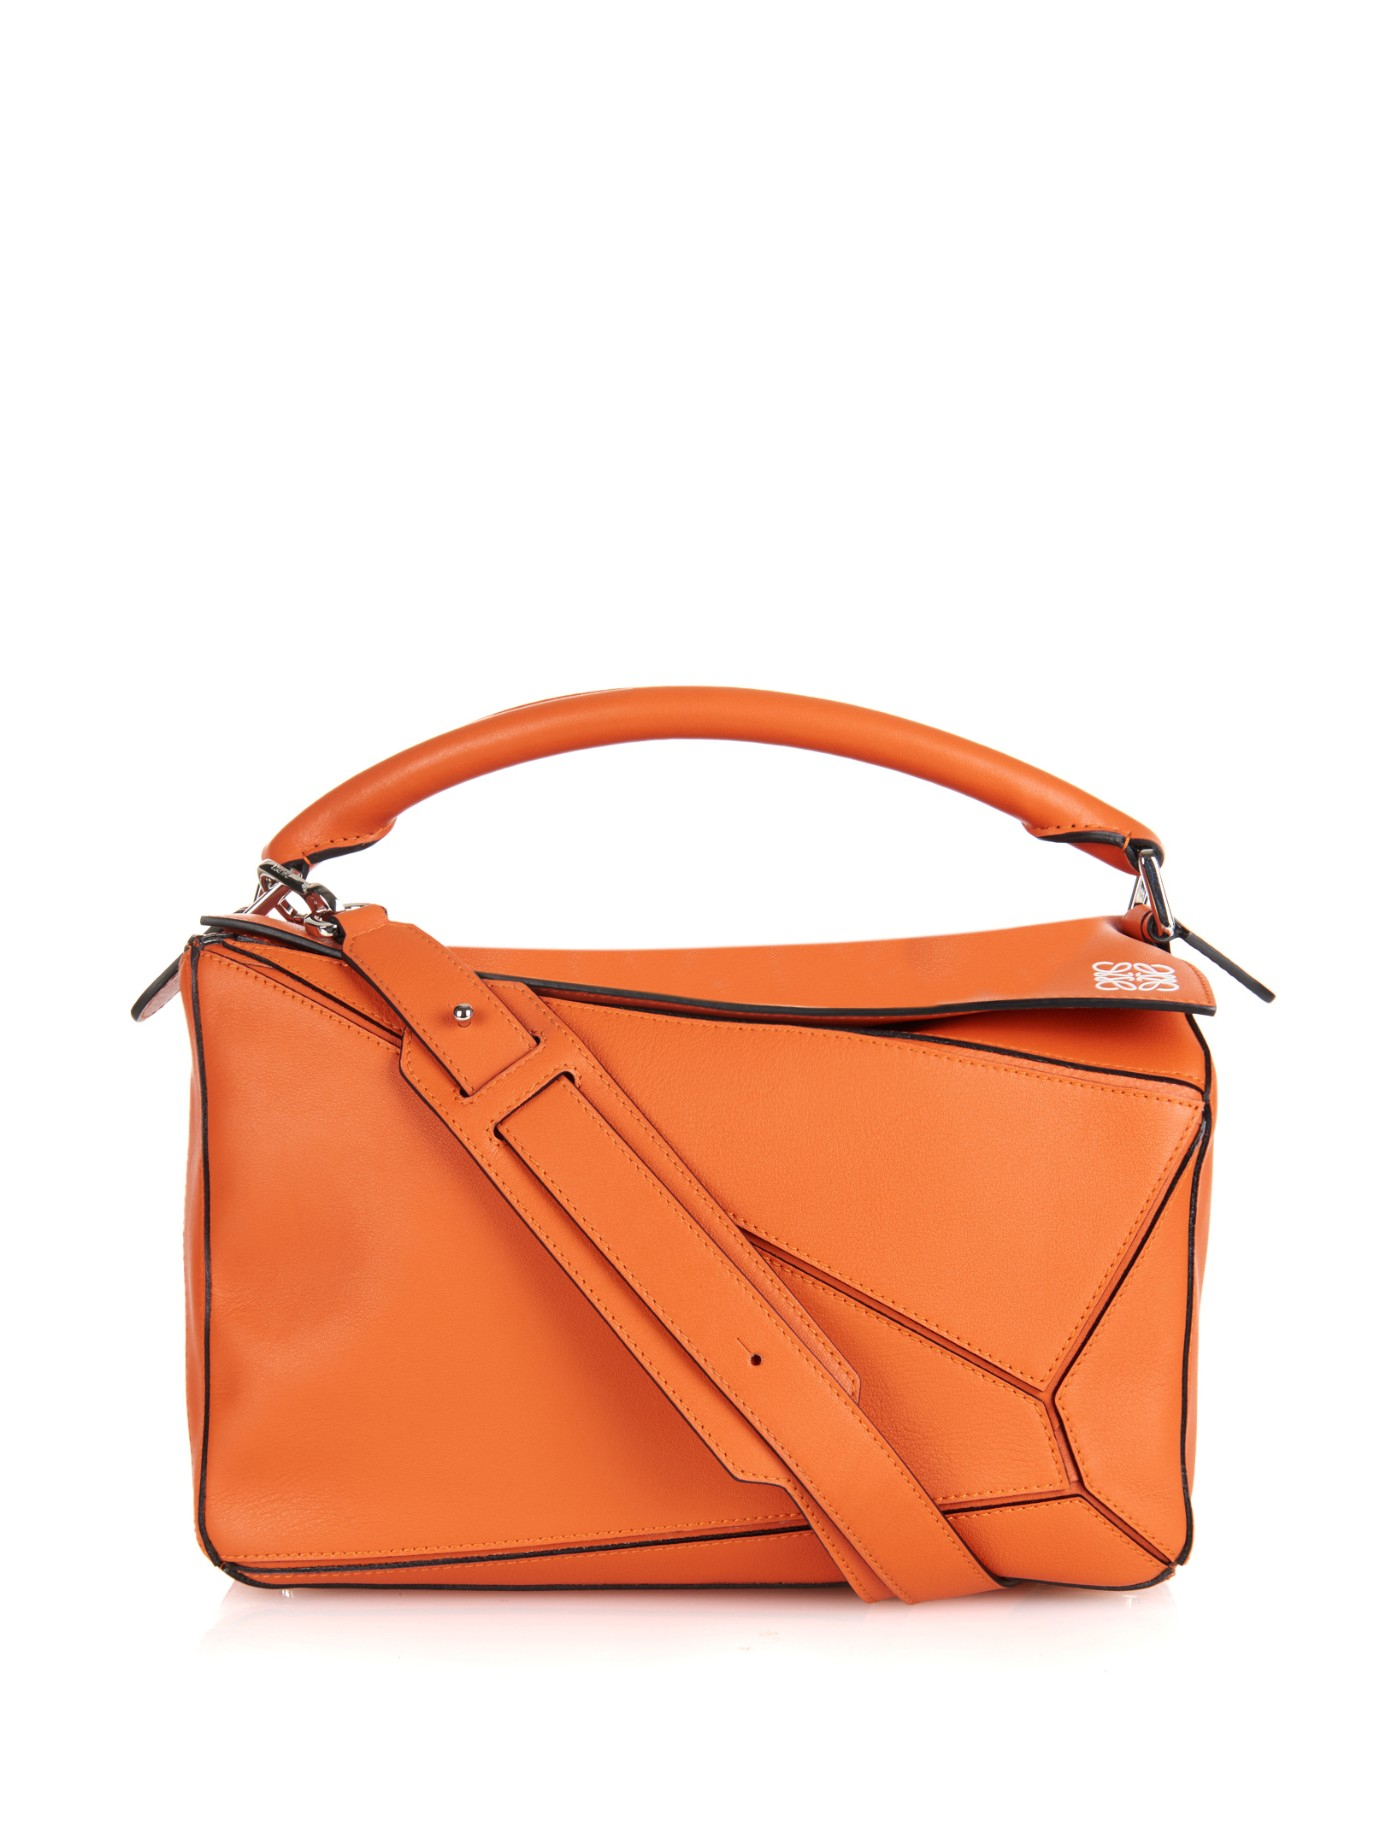 Loewe Leather Puzzle Bag in Orange | Lyst